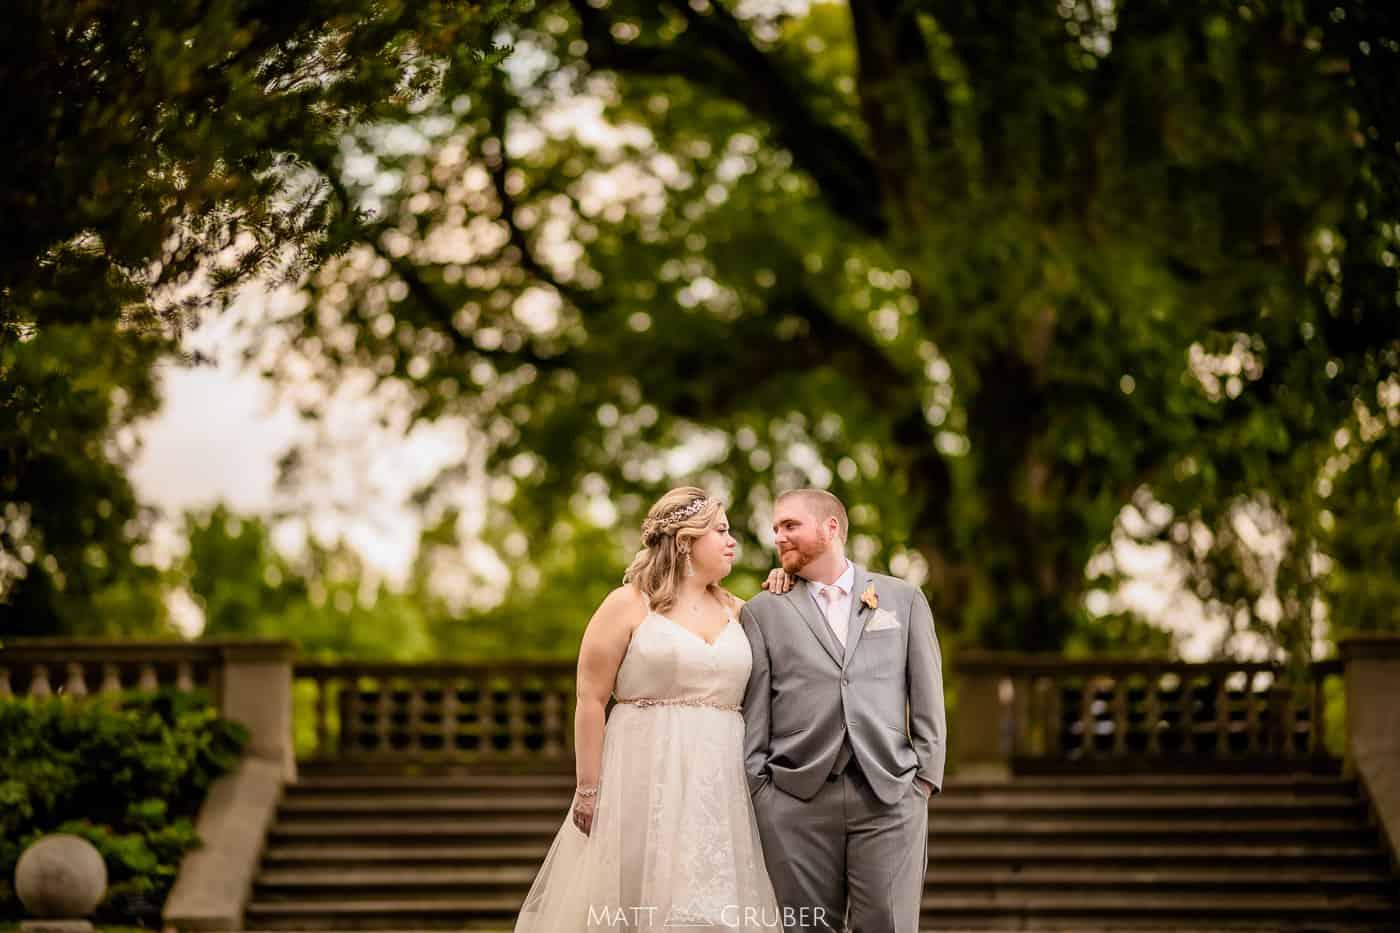 bride and groom portraits at Curtis hall arboretum